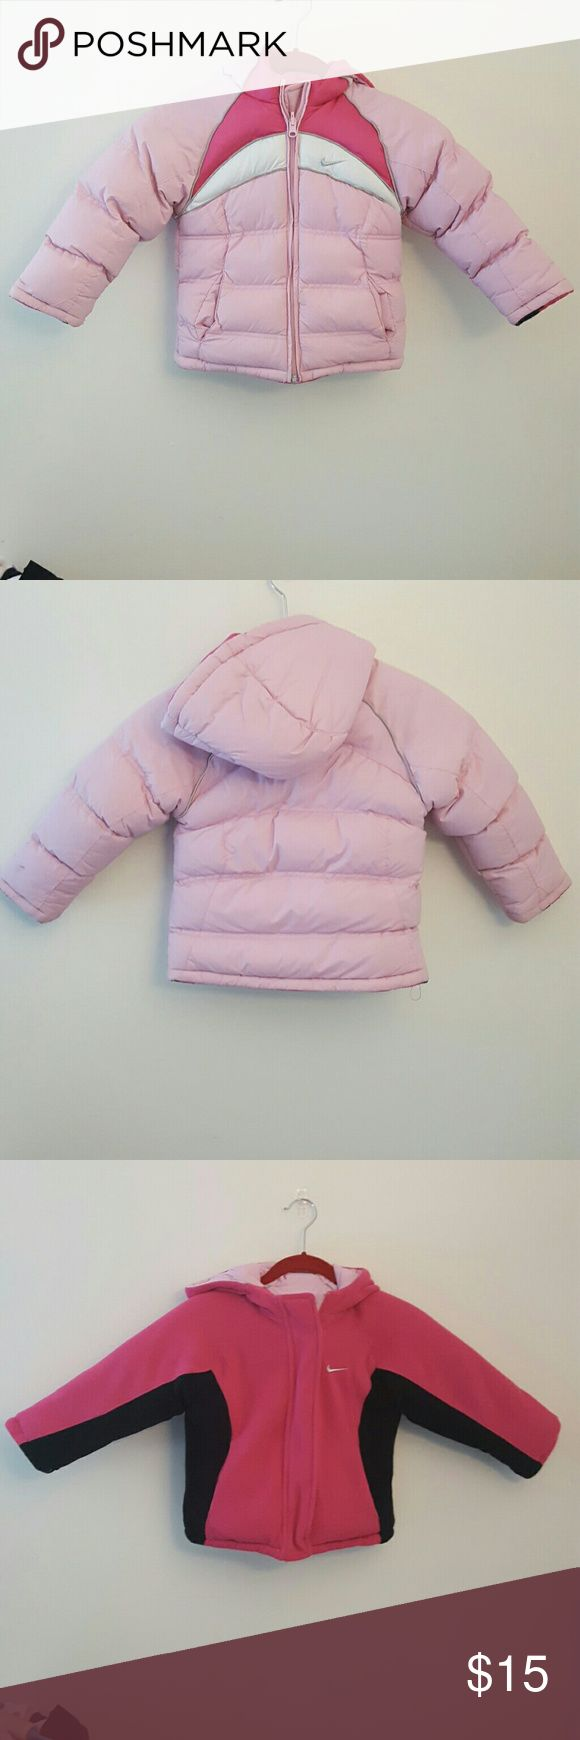 Reversible Nike winter jacket light pink nike jacket that can be worn 2 ways Nike Jackets & Coats Puffers